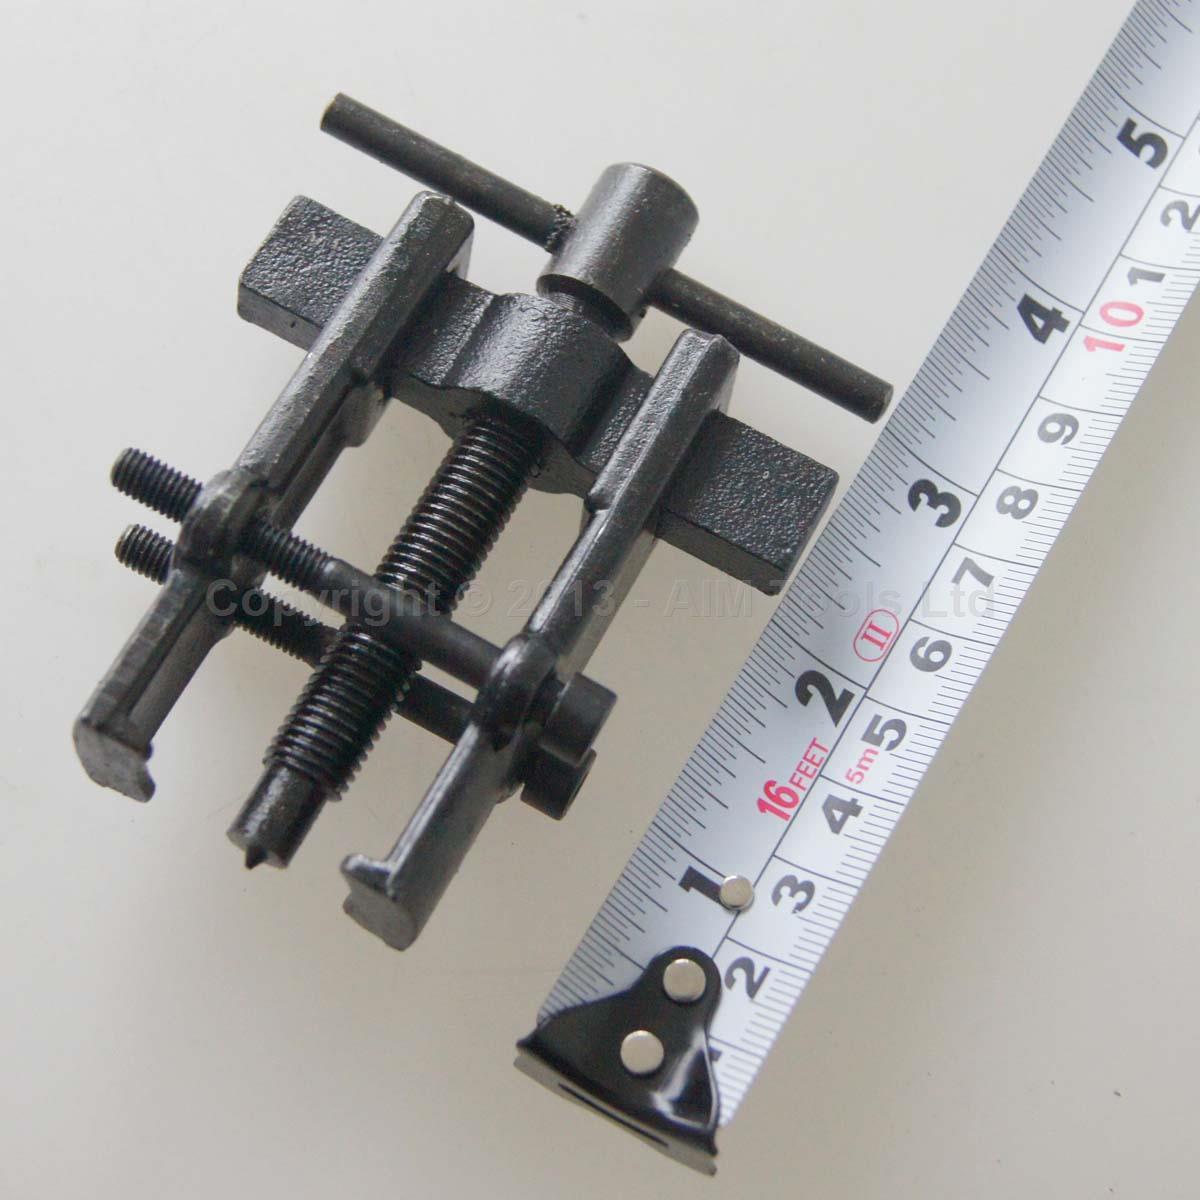 Gear puller and bearing puller : Mini arm puller bearing gear